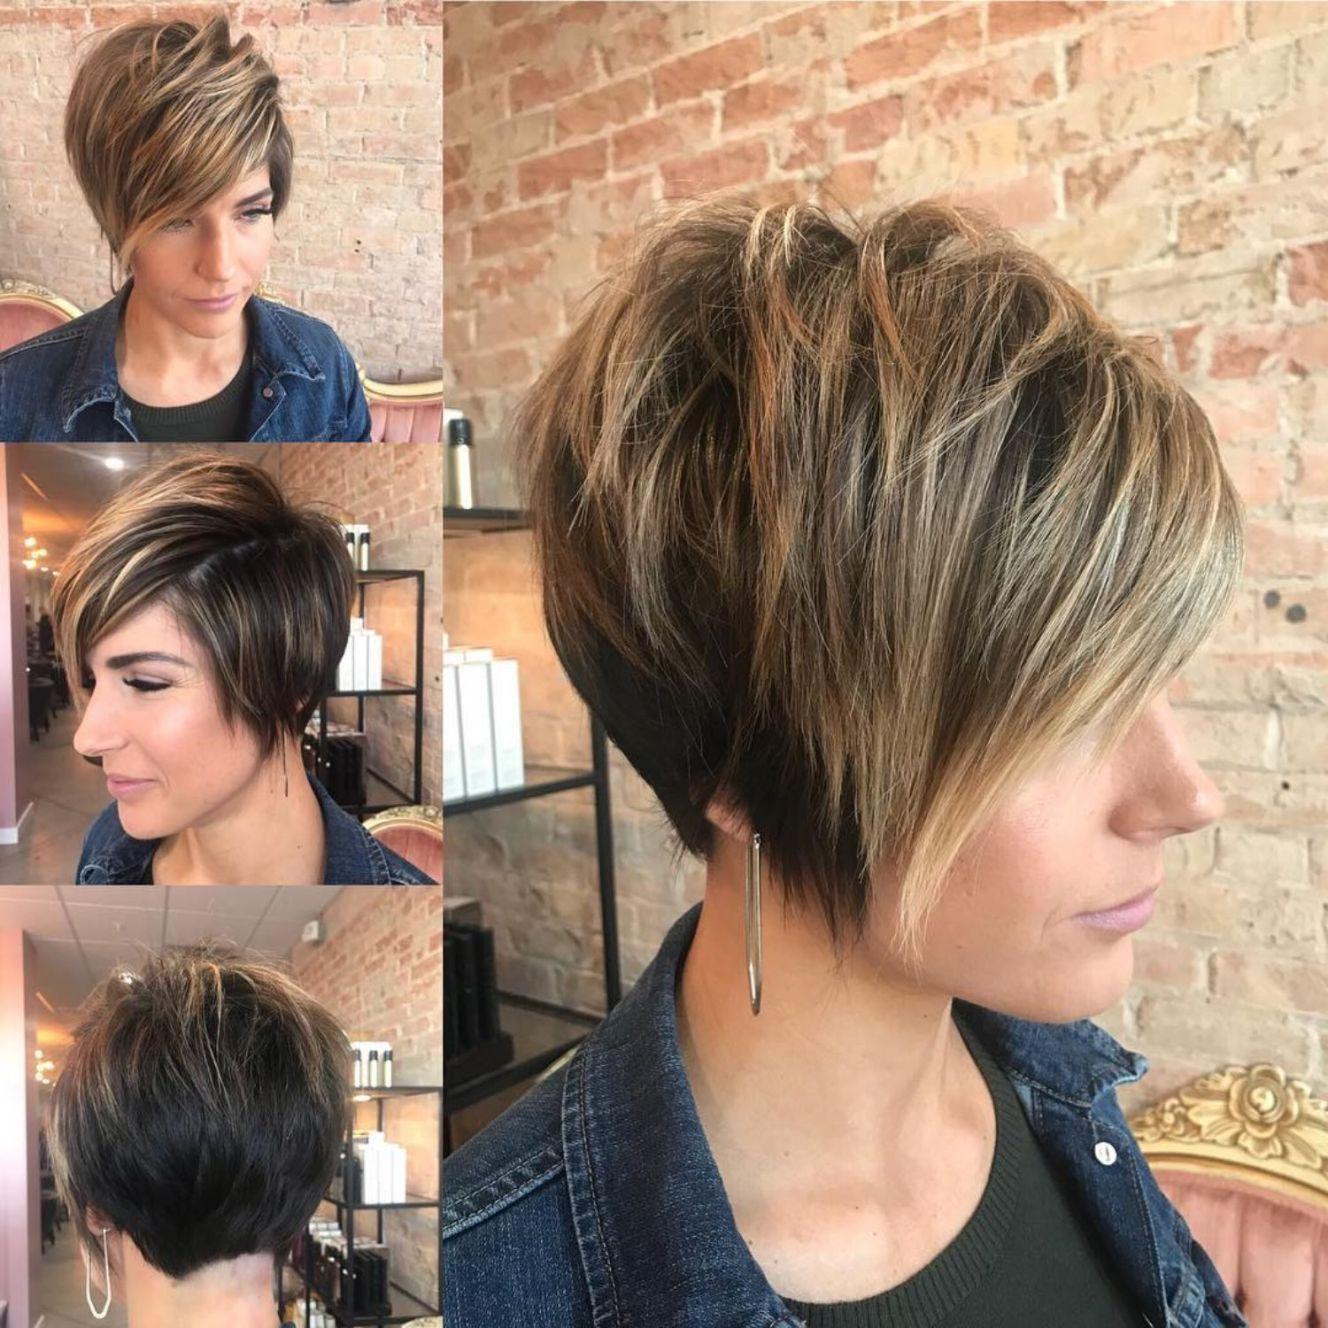 60 Gorgeous Long Pixie Hairstyles Long Pixie Hairstyles Pixie Haircut For Thick Hair Haircut For Thick Hair